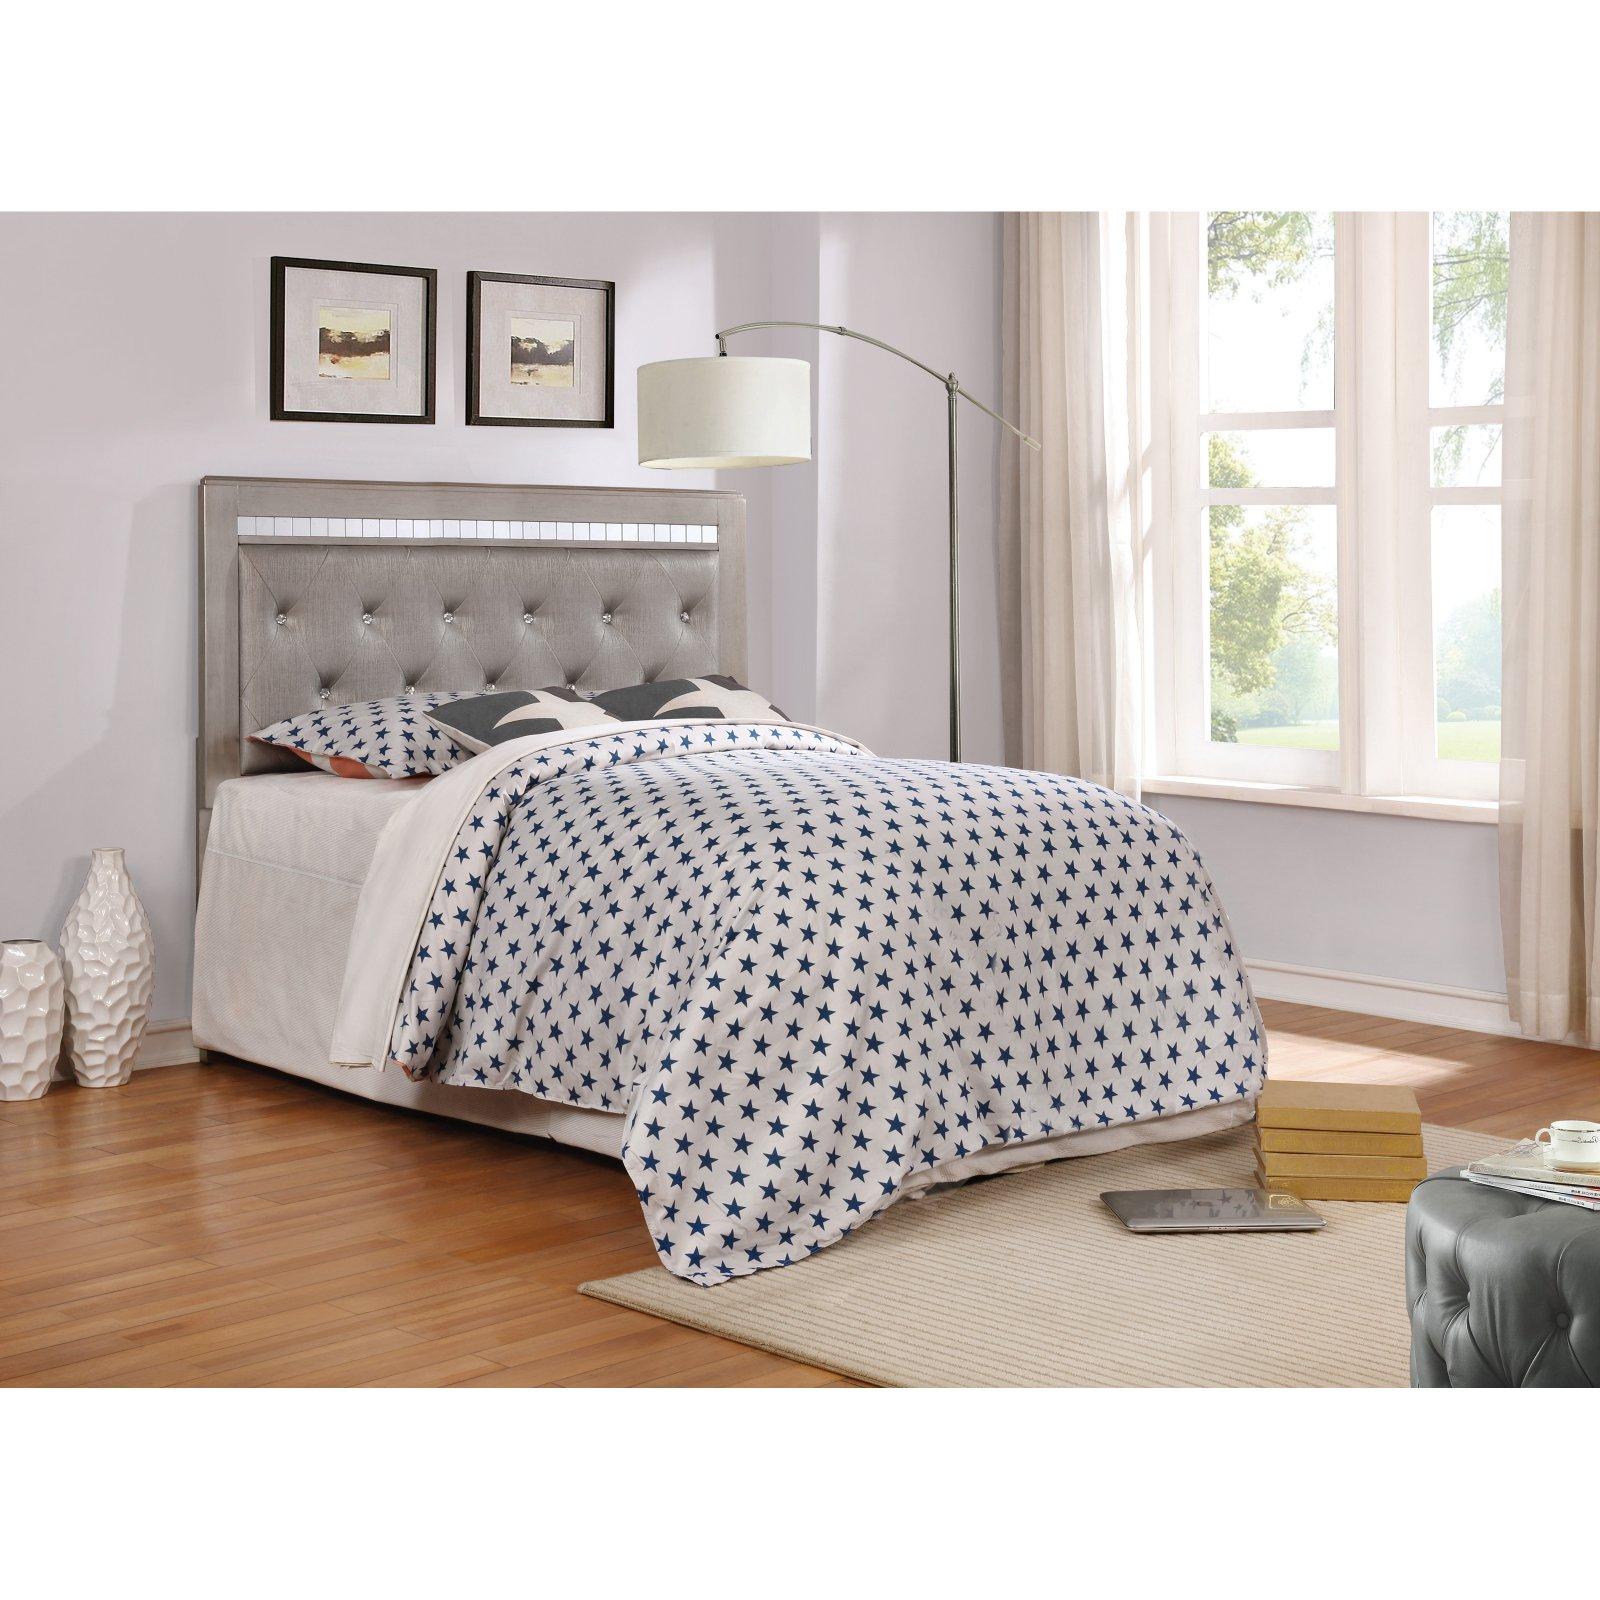 Coaster Furniture Anastasha Panel Bed